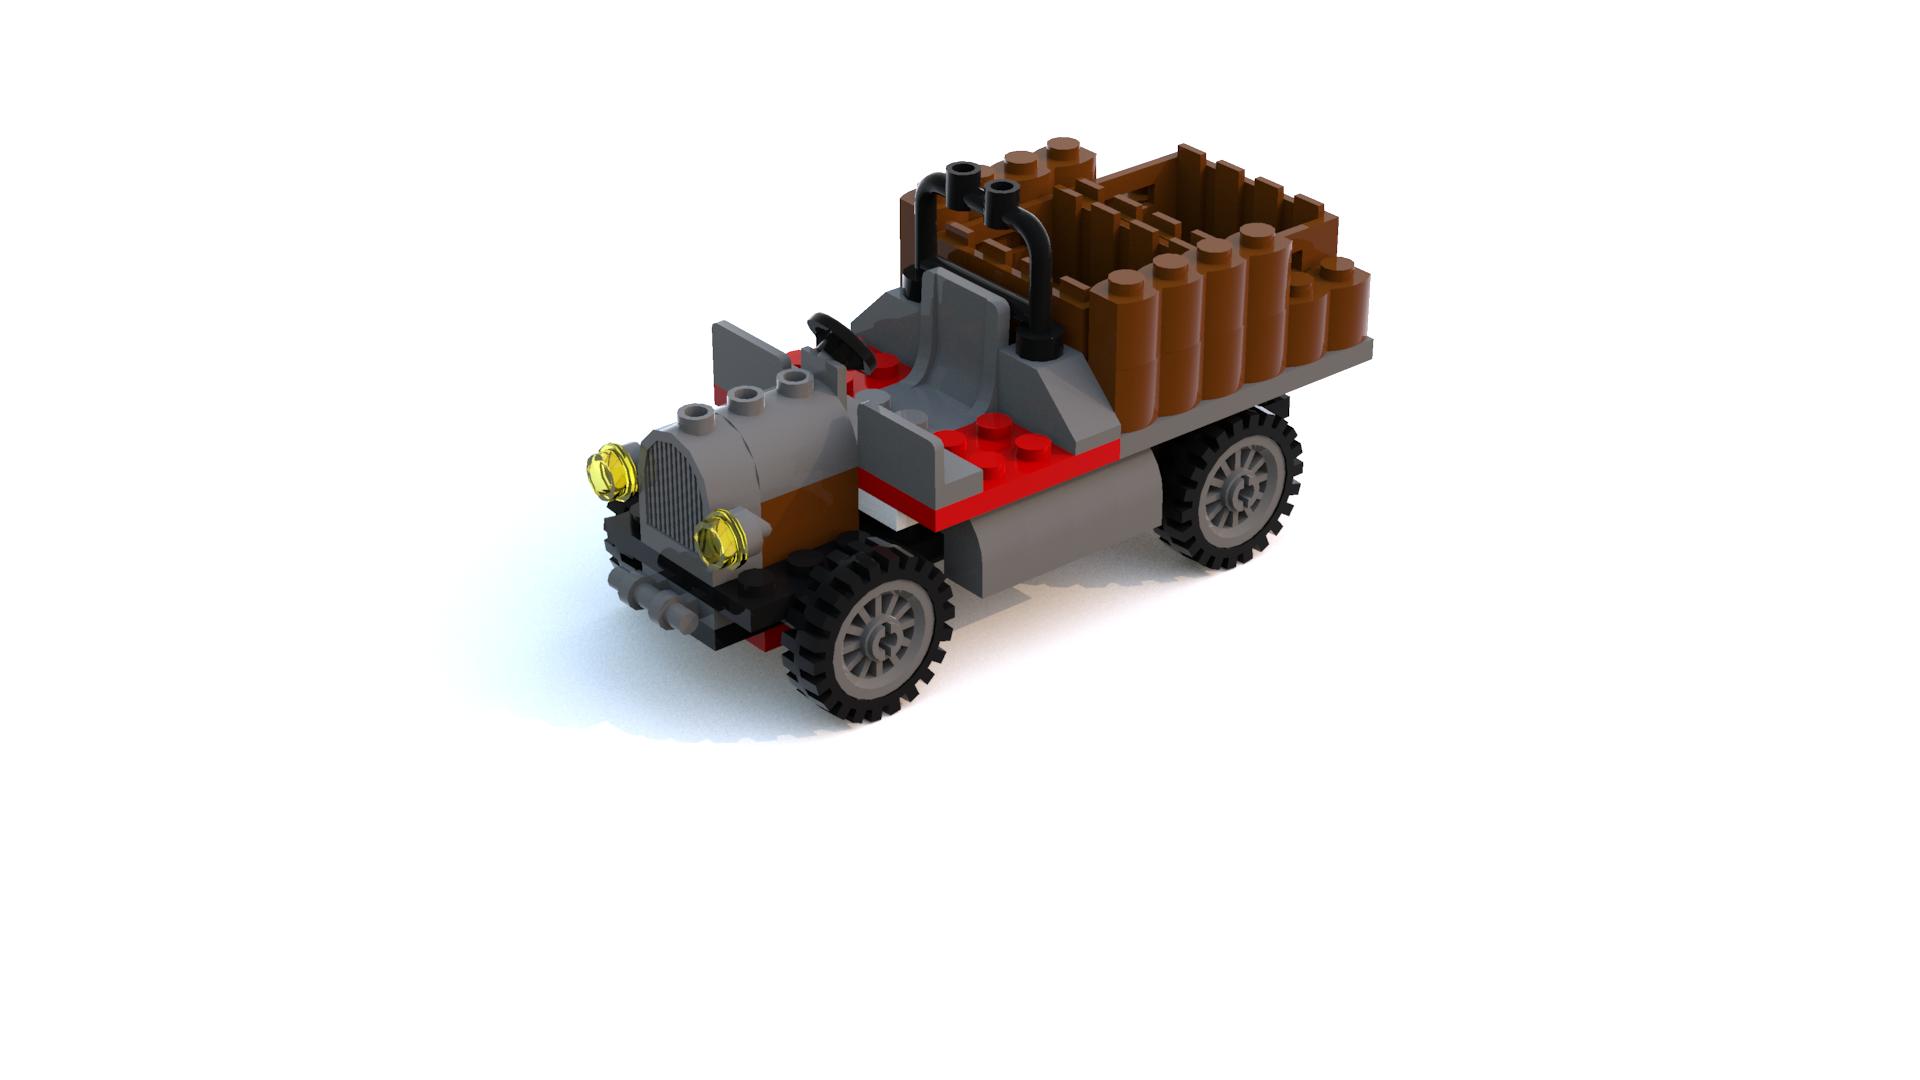 Lego Racers 2 Dino Island Pre-Built Car LDD Model - Personal